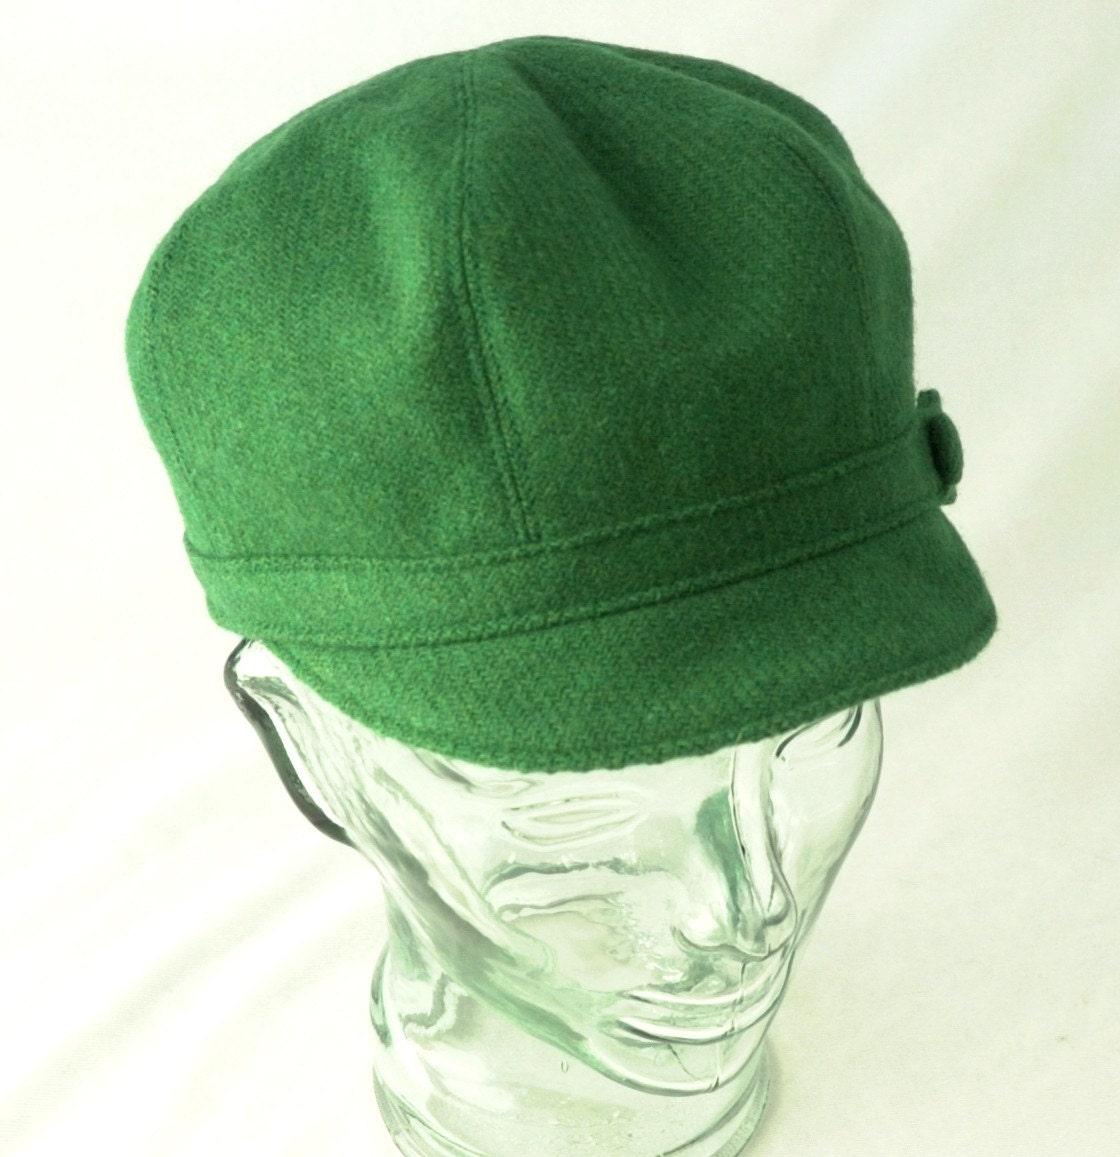 Vibrant Green Wool Newsboy Hat - Janis - M